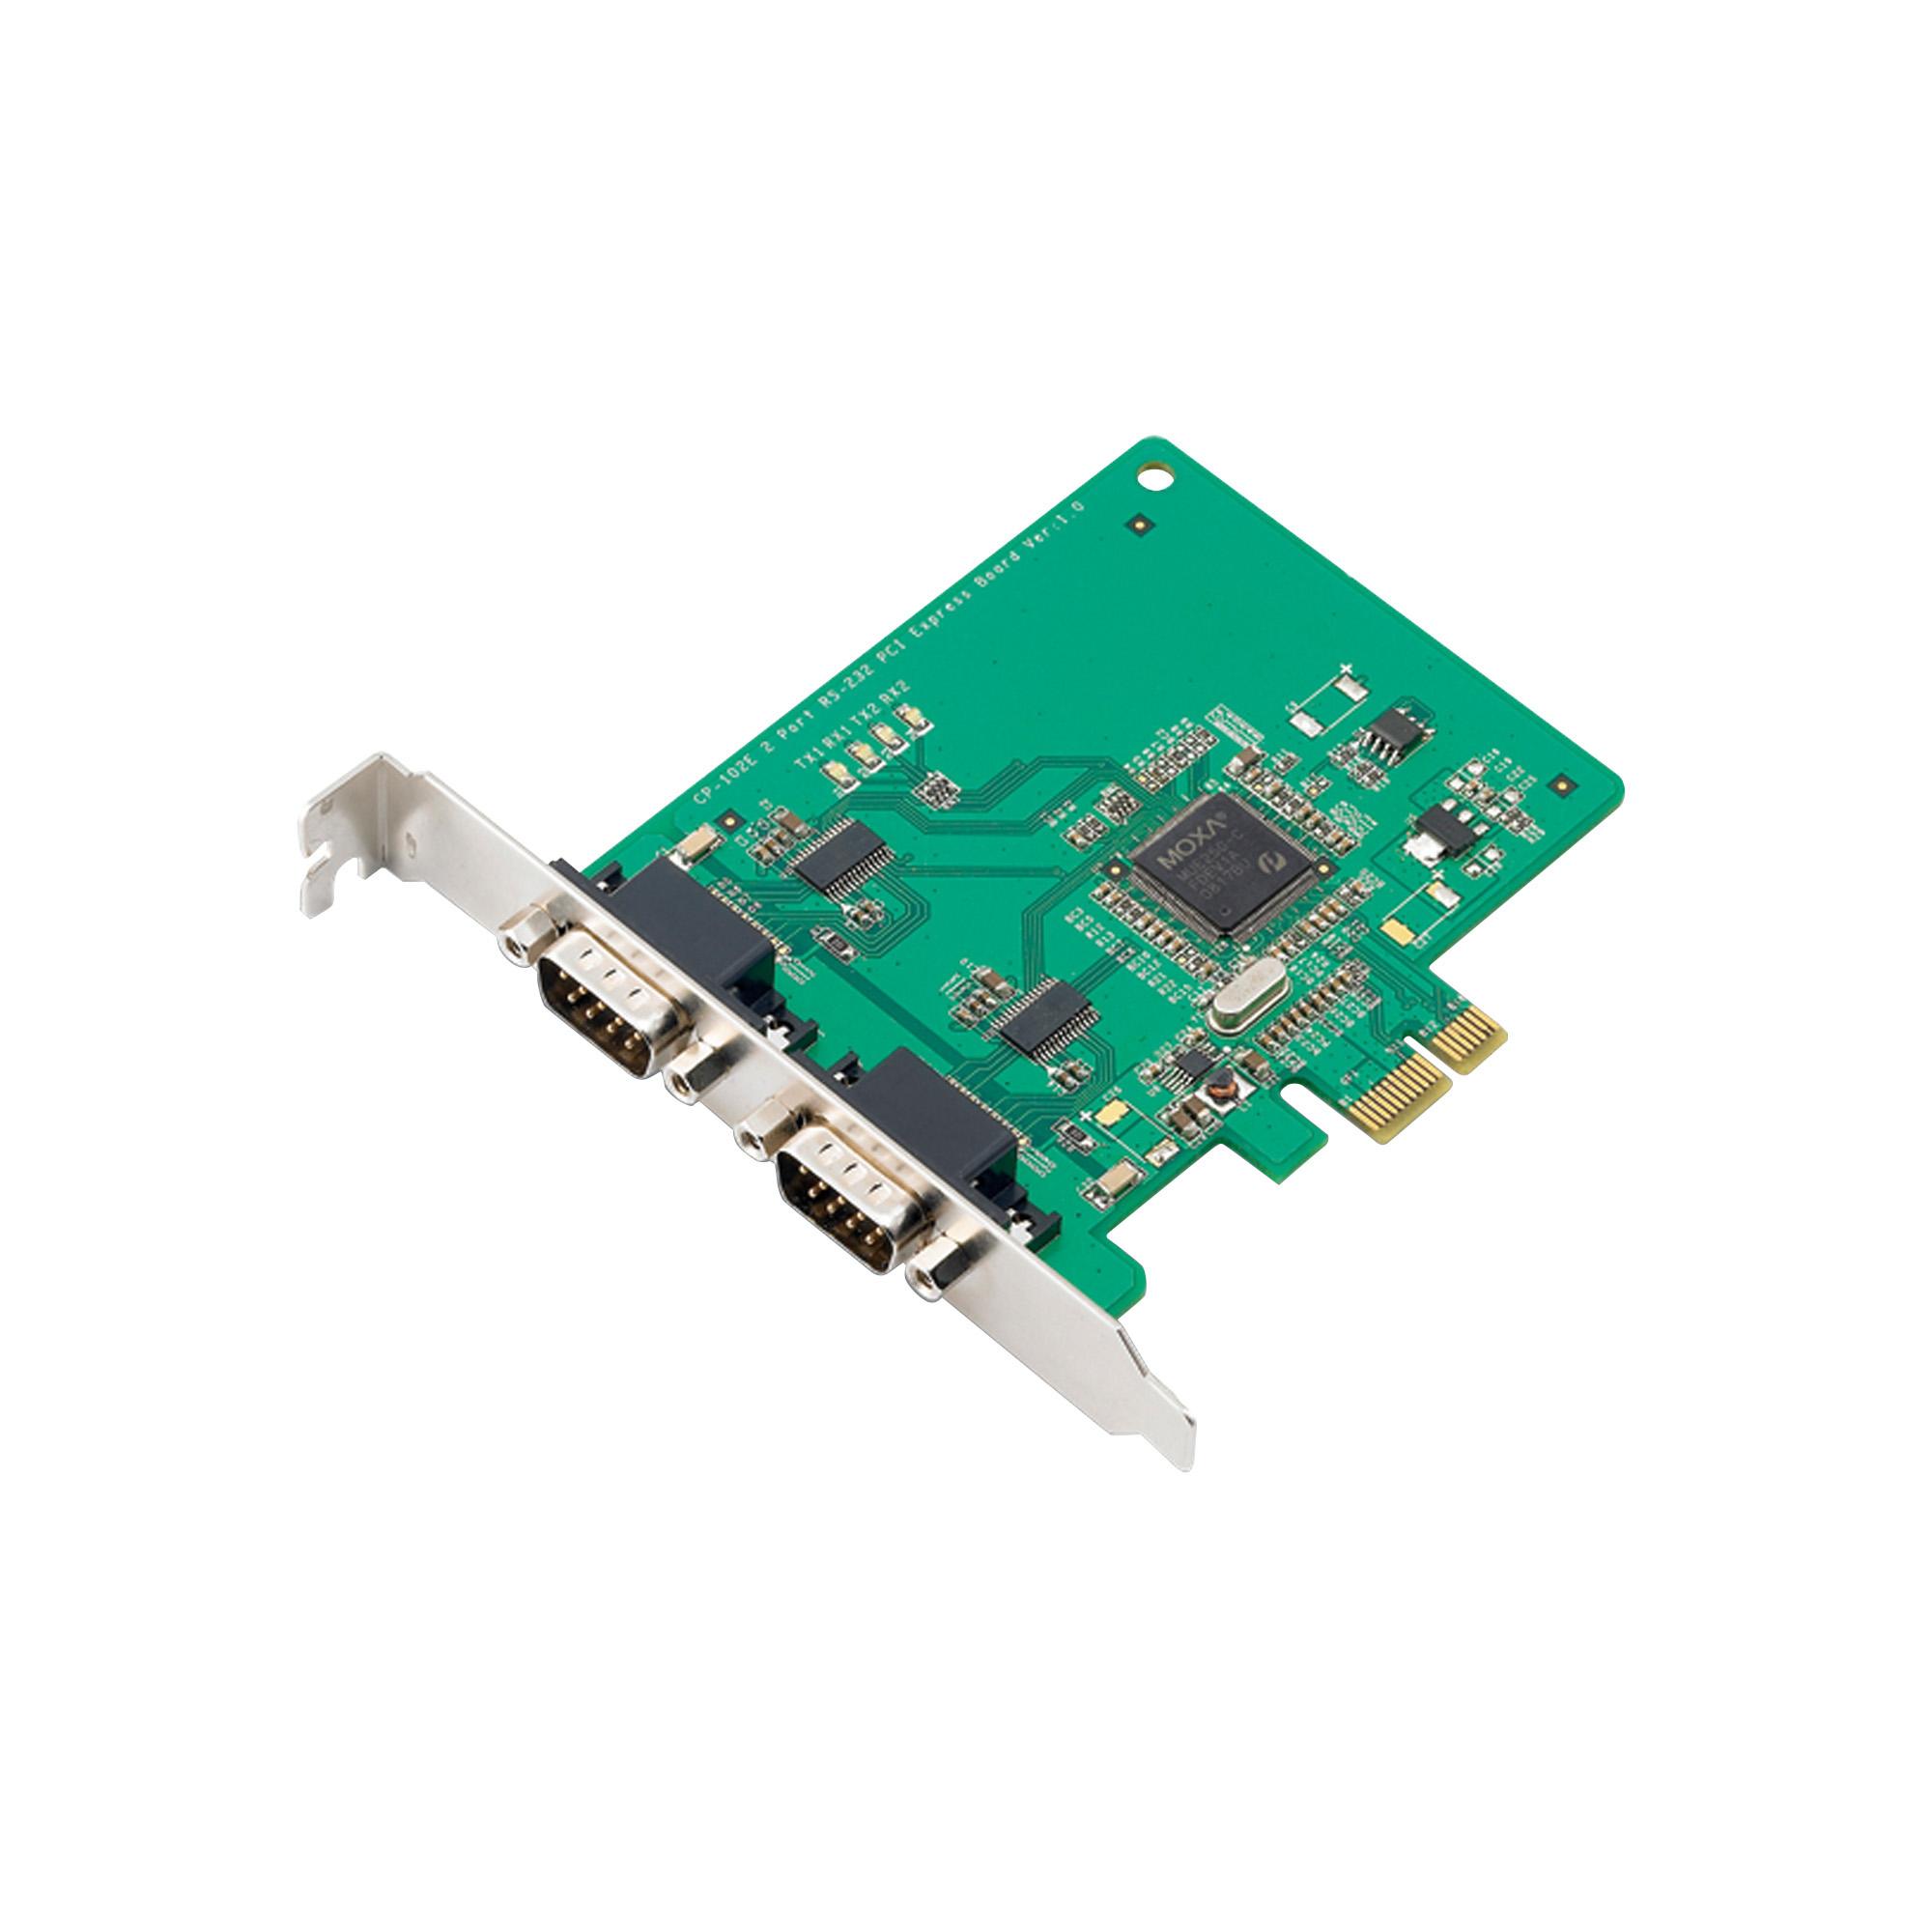 CP-102E/102EL Series - PCIe/UPCI/PCI Serial Cards | MOXA